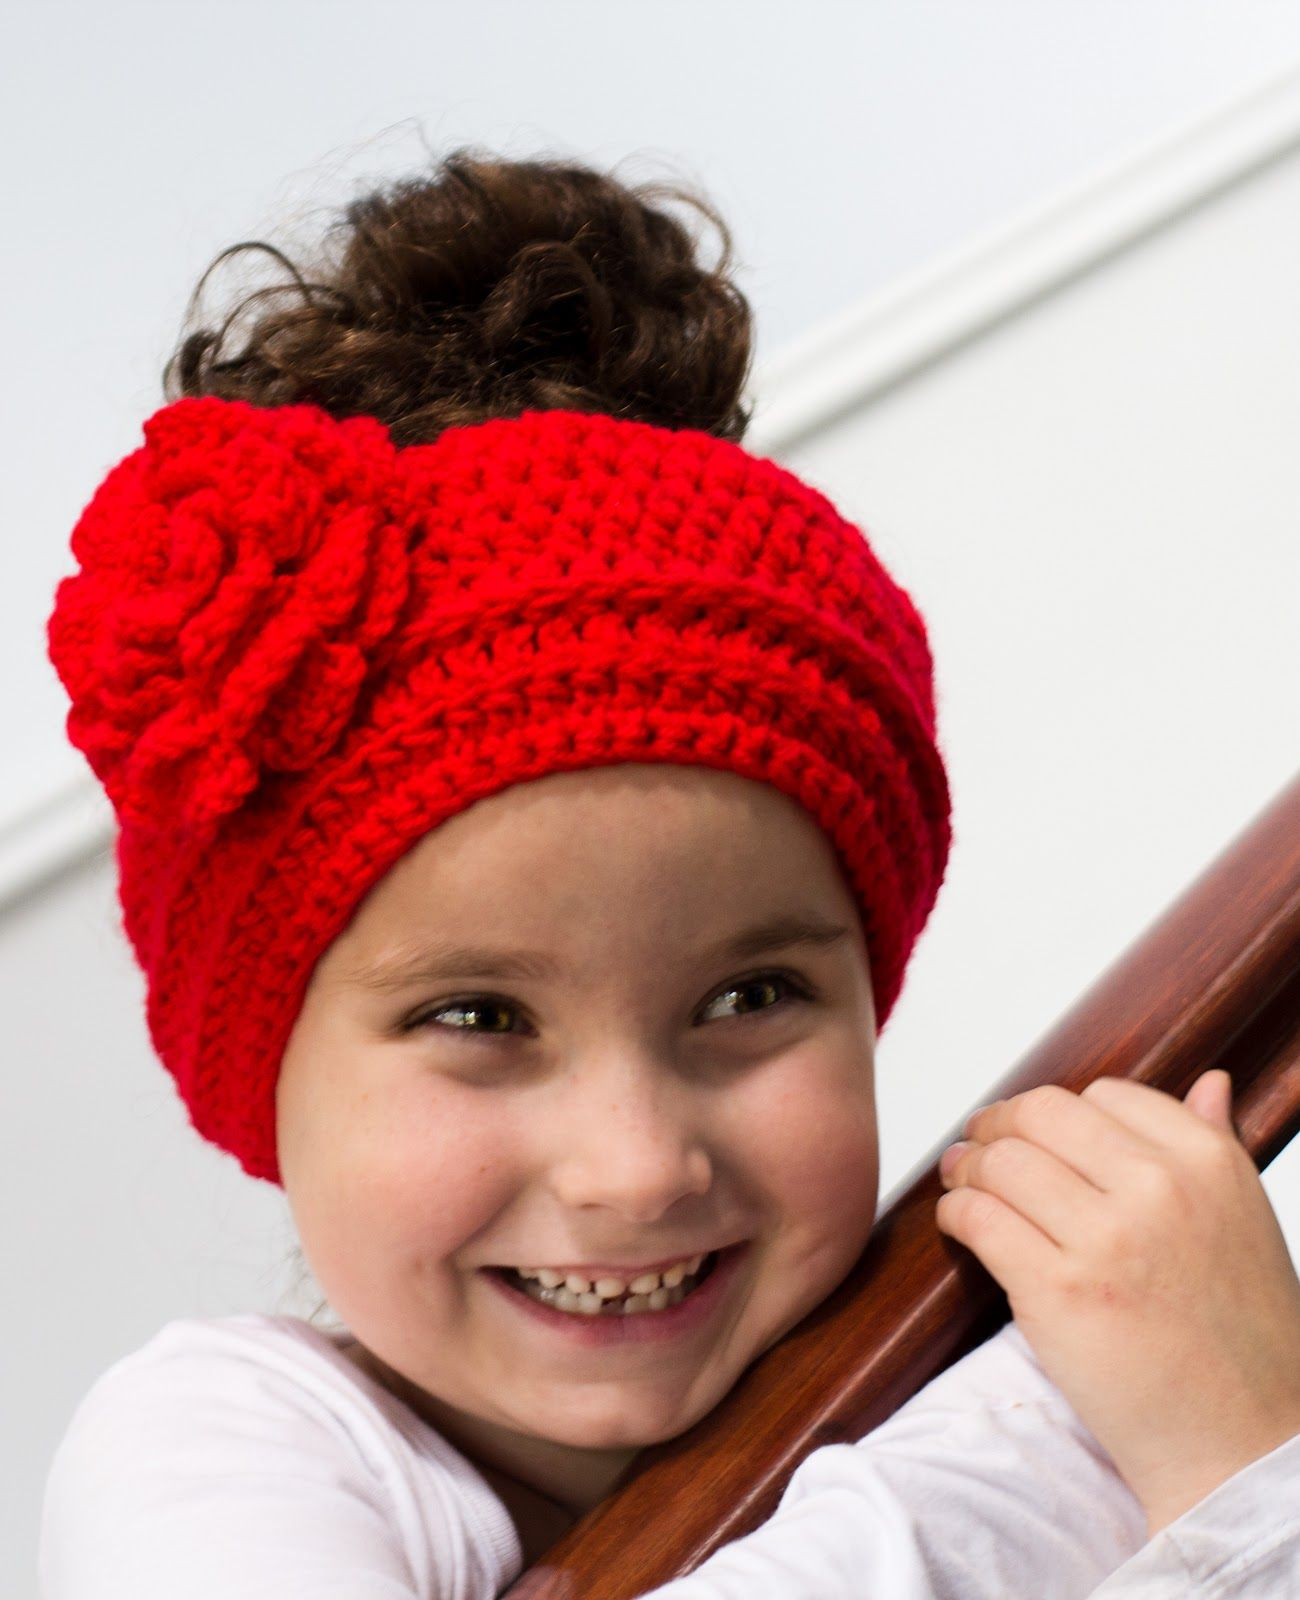 Crochet: Patterns, Articles, eBooks, Magazines, Videos | Häkeln baby ...